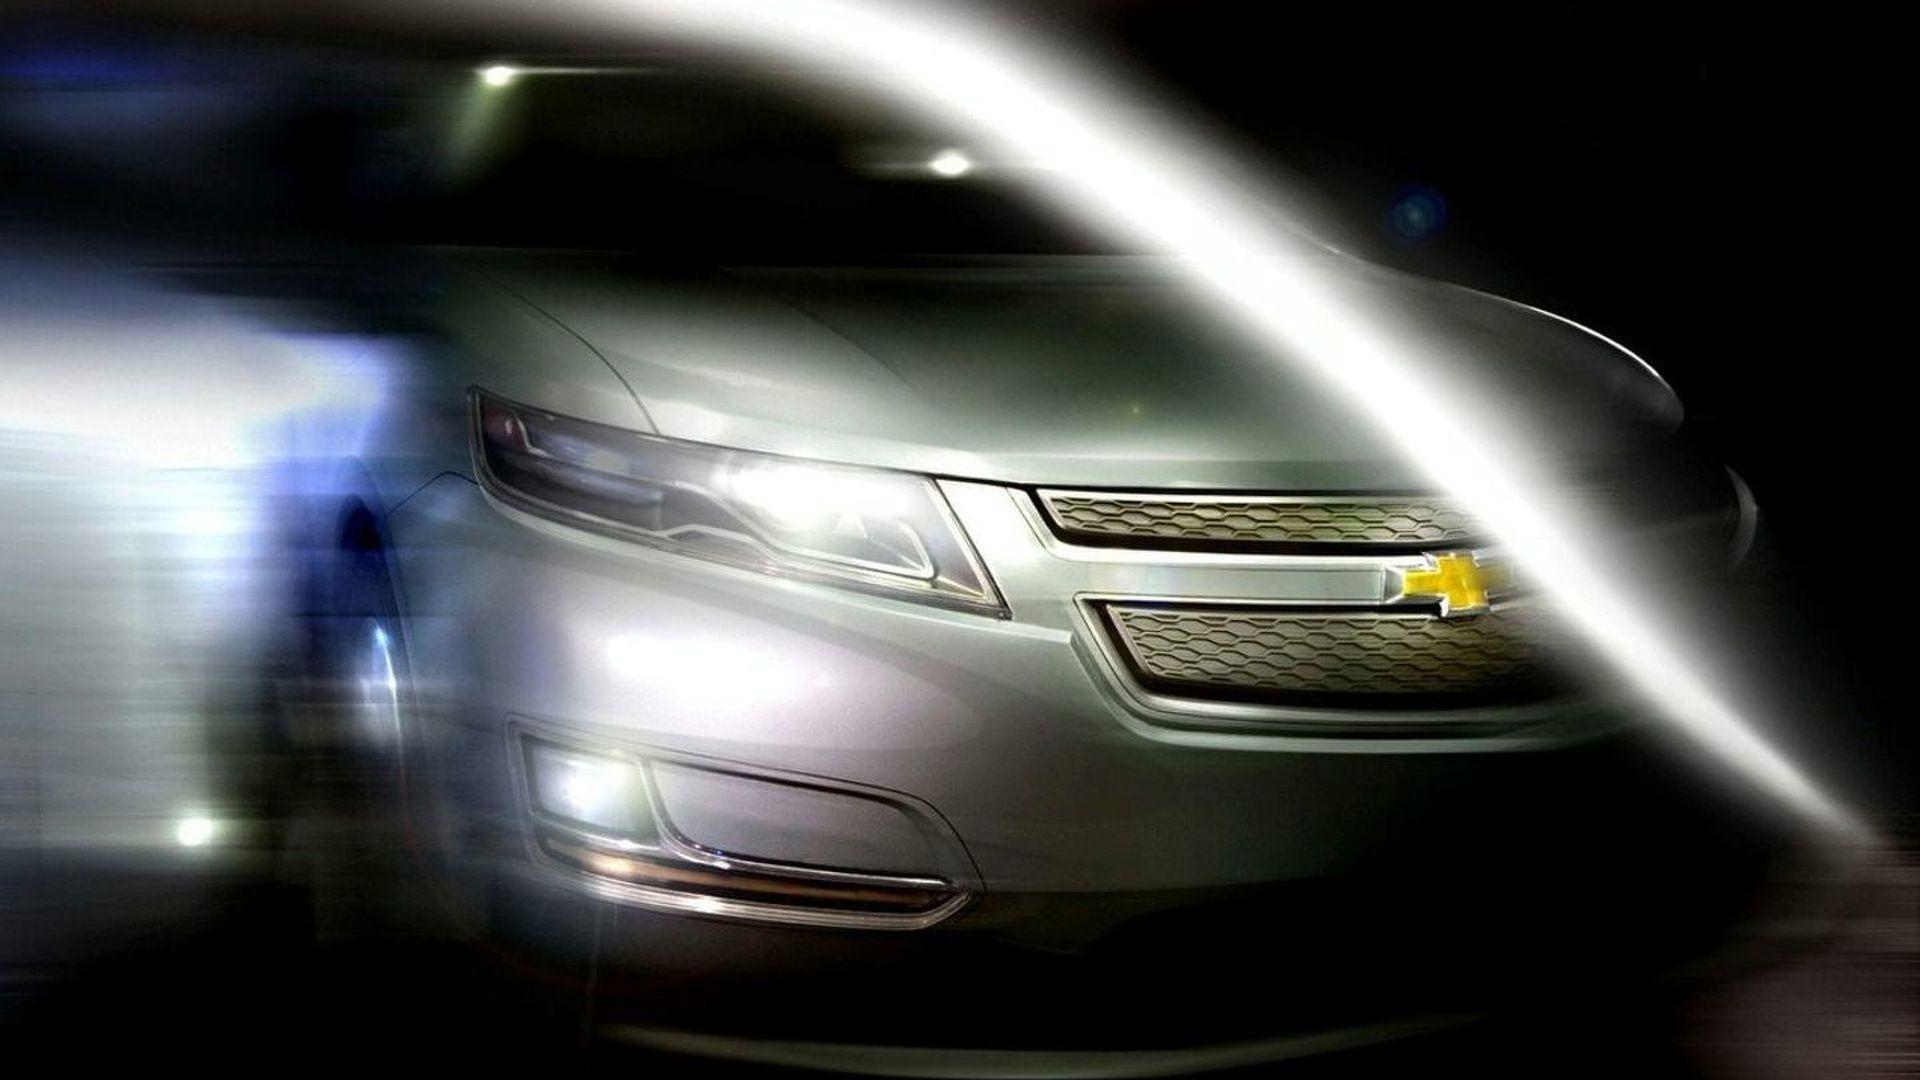 GM Release First Teaser Shot of Production Chevrolet Volt